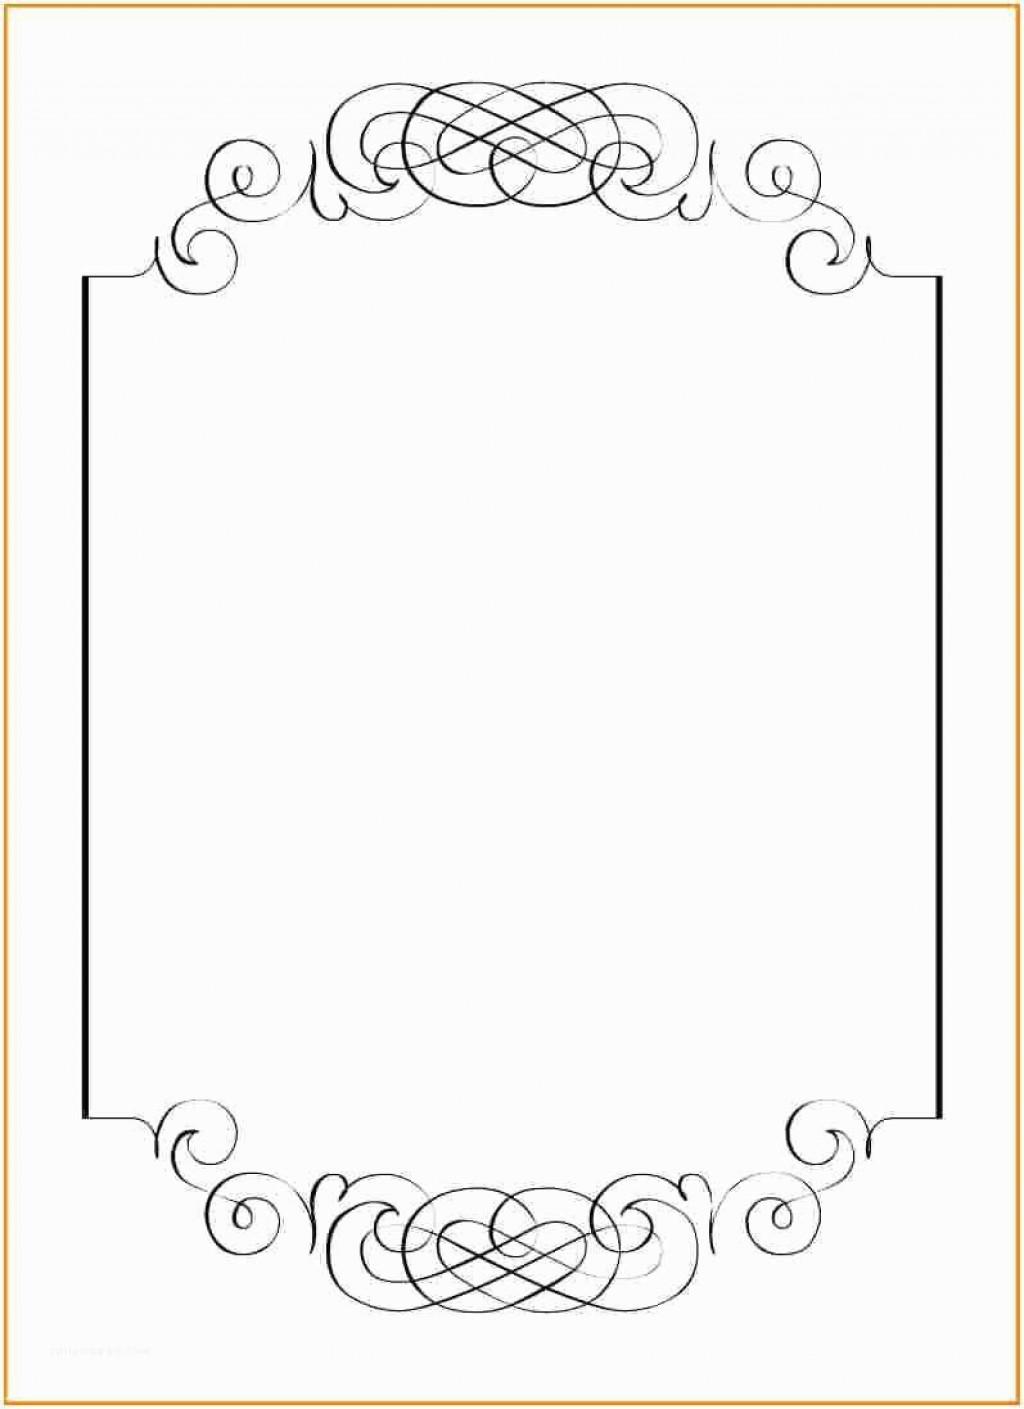 007 Phenomenal Wedding Invitation Template Word Picture  Invite Wording Uk Anniversary Microsoft Free MarriageLarge